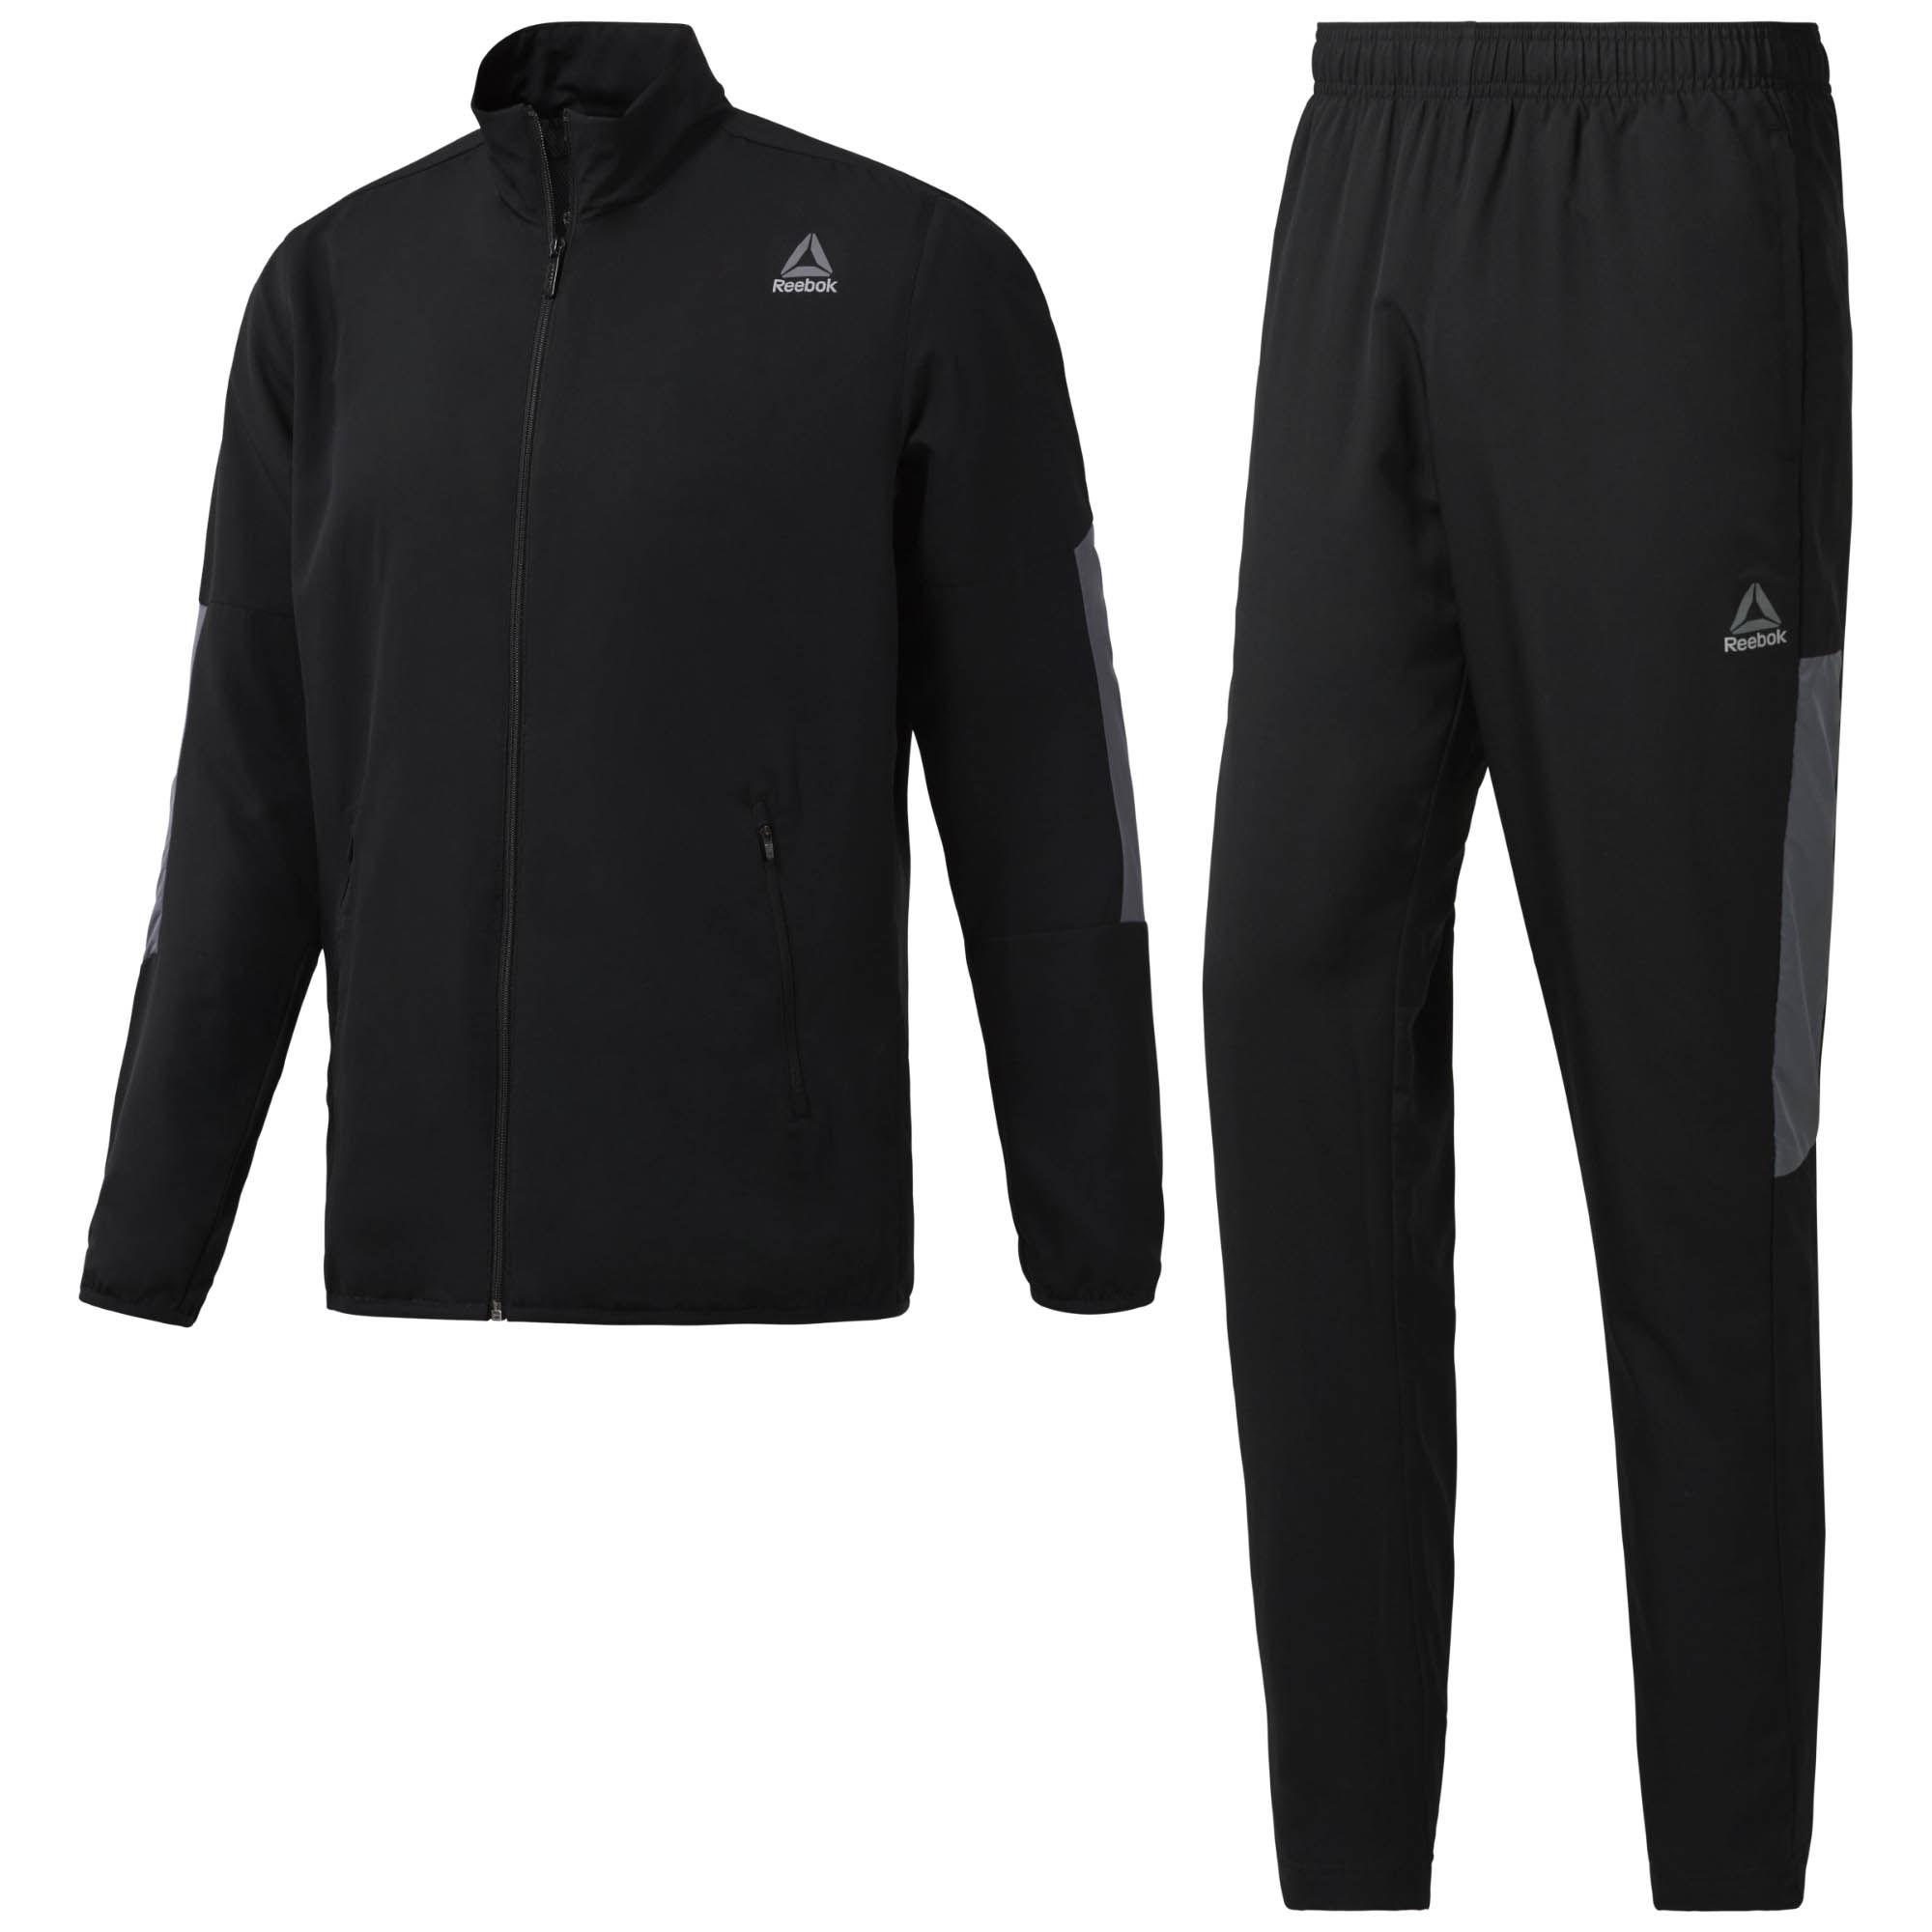 Спортивный костюм мужской Reebok Ts Techy Woven, цвет: черный. BQ5806. Размер M (48/50)BQ5806